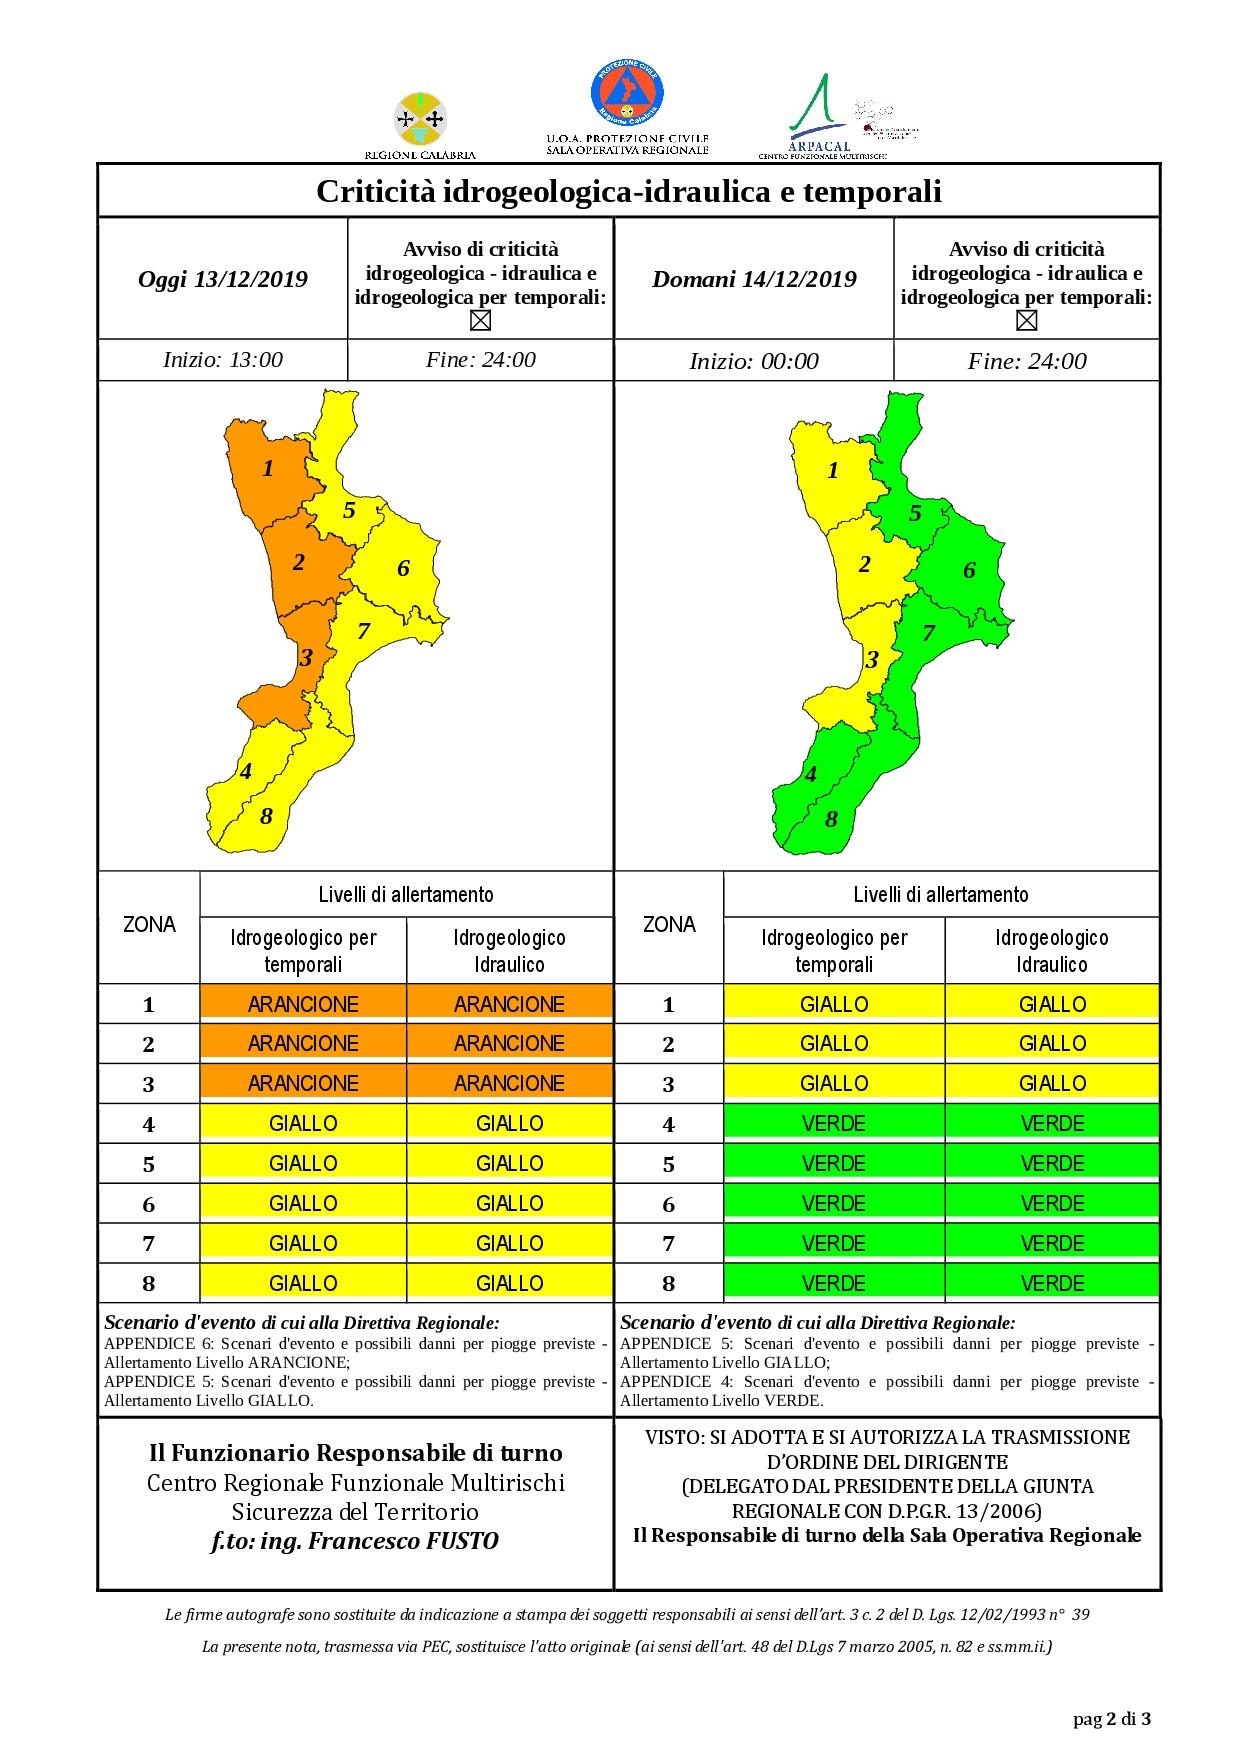 Criticità idrogeologica-idraulica e temporali in Calabria 13-12-2019